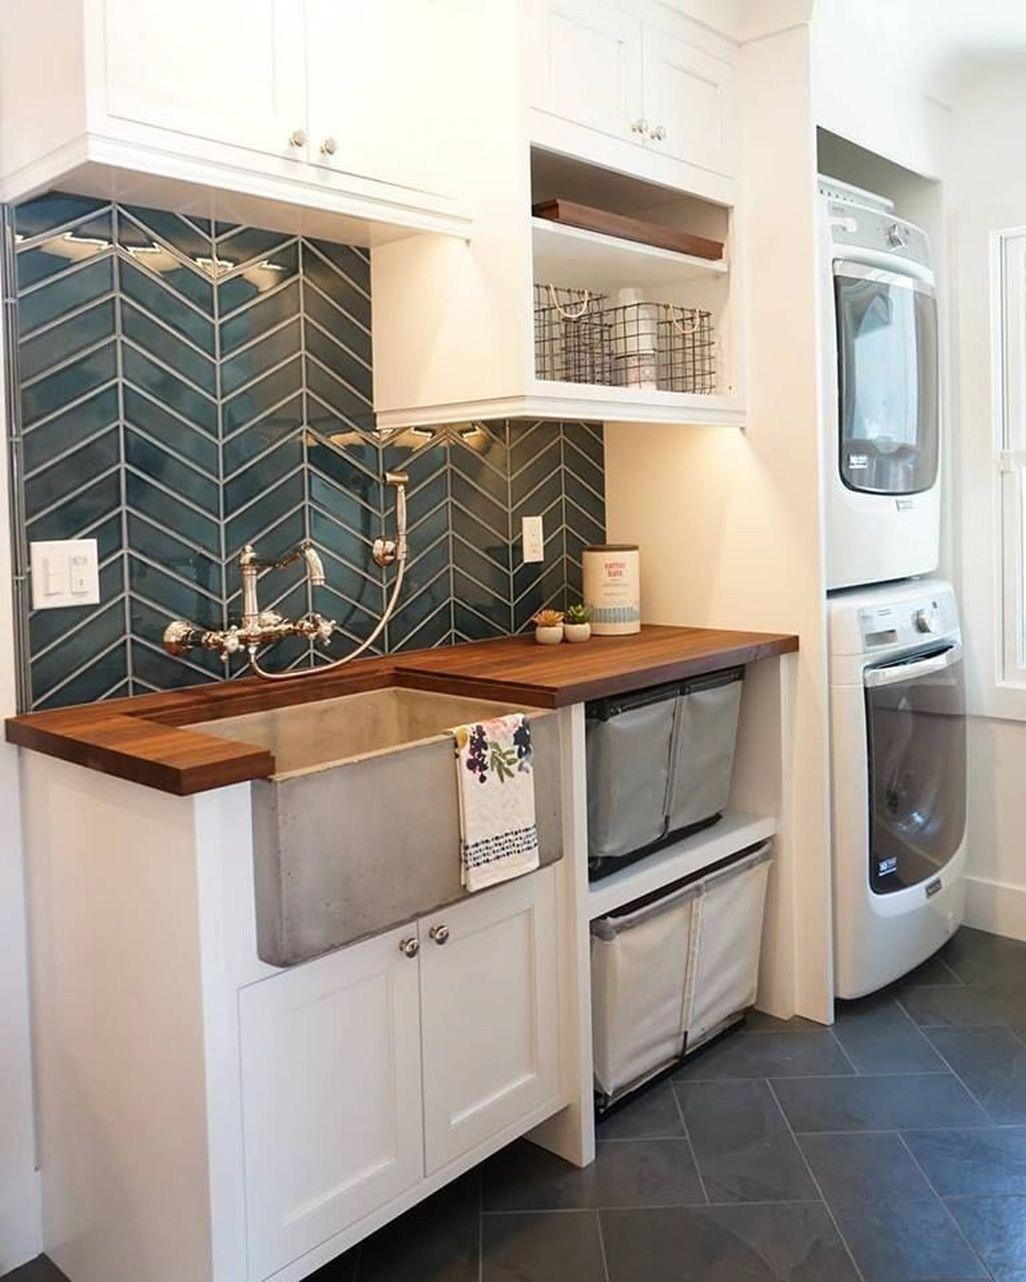 40 Modern Basement Remodel Laundry Room Ideas images